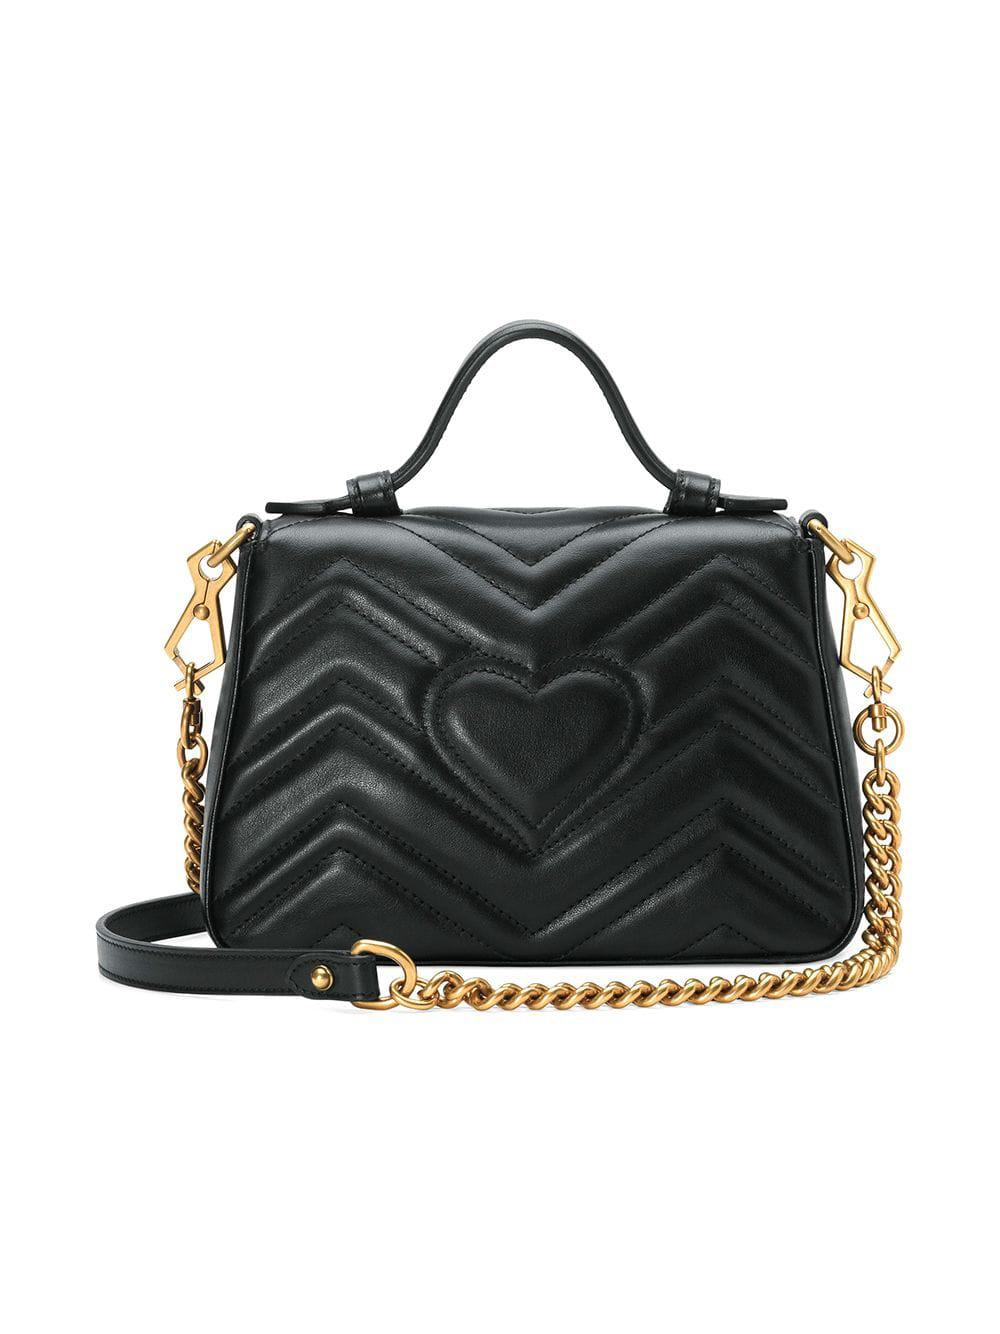 666055e647dc Gucci GG Marmont Mini Top Handle Bag in Black - Lyst